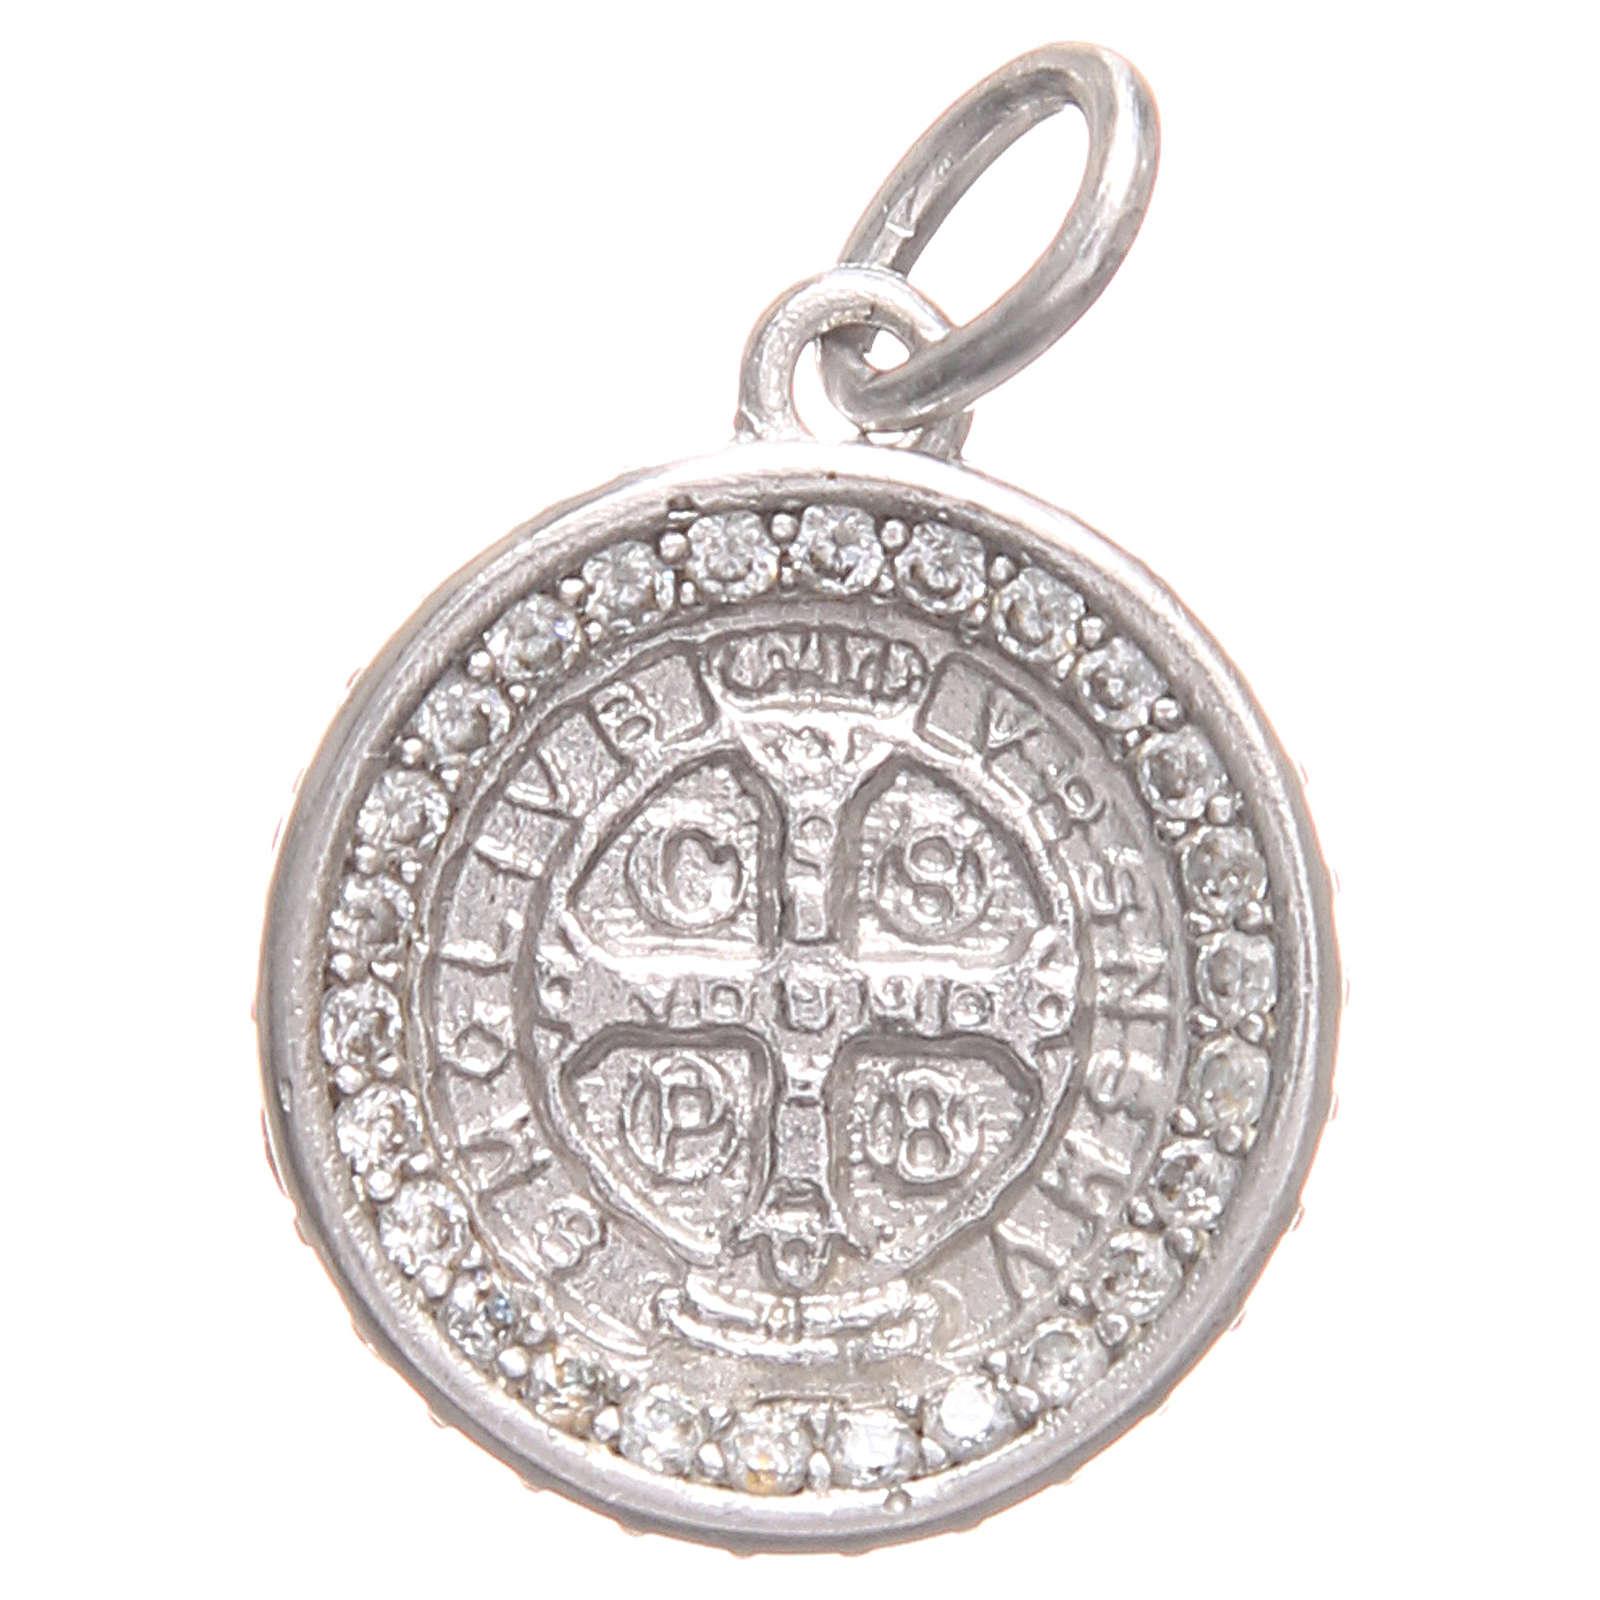 Medalla plata 800 Cruz San Benito diám. 1,7 cm 4